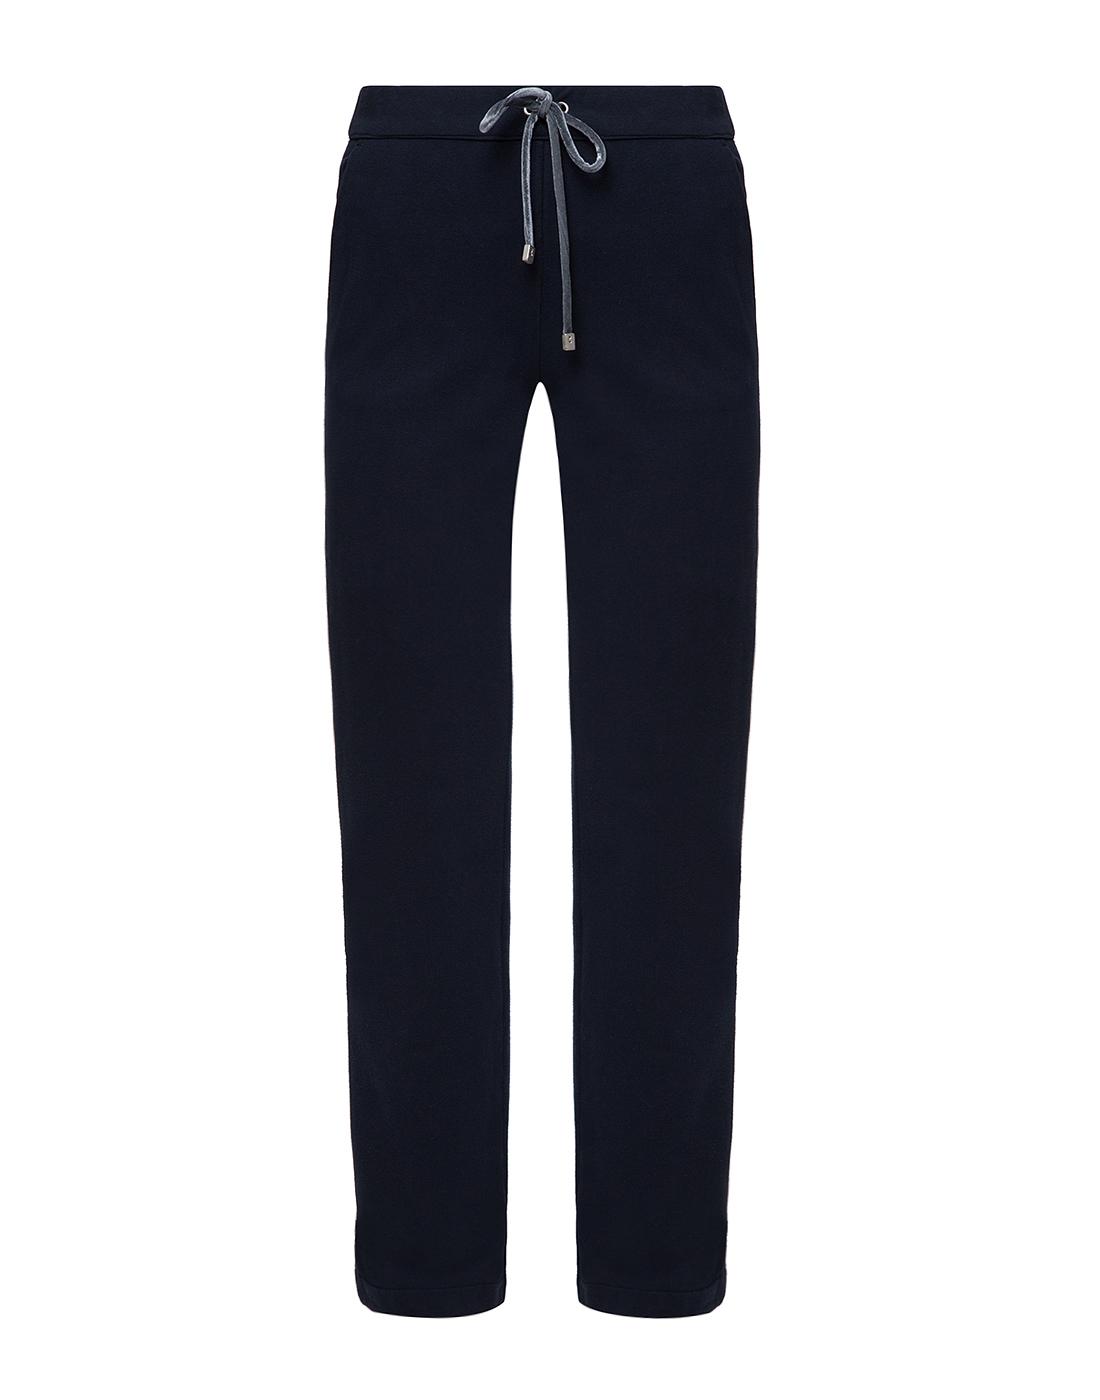 Женские темно-синие спортивные брюки Capobianco S5W715.FZ00.-1